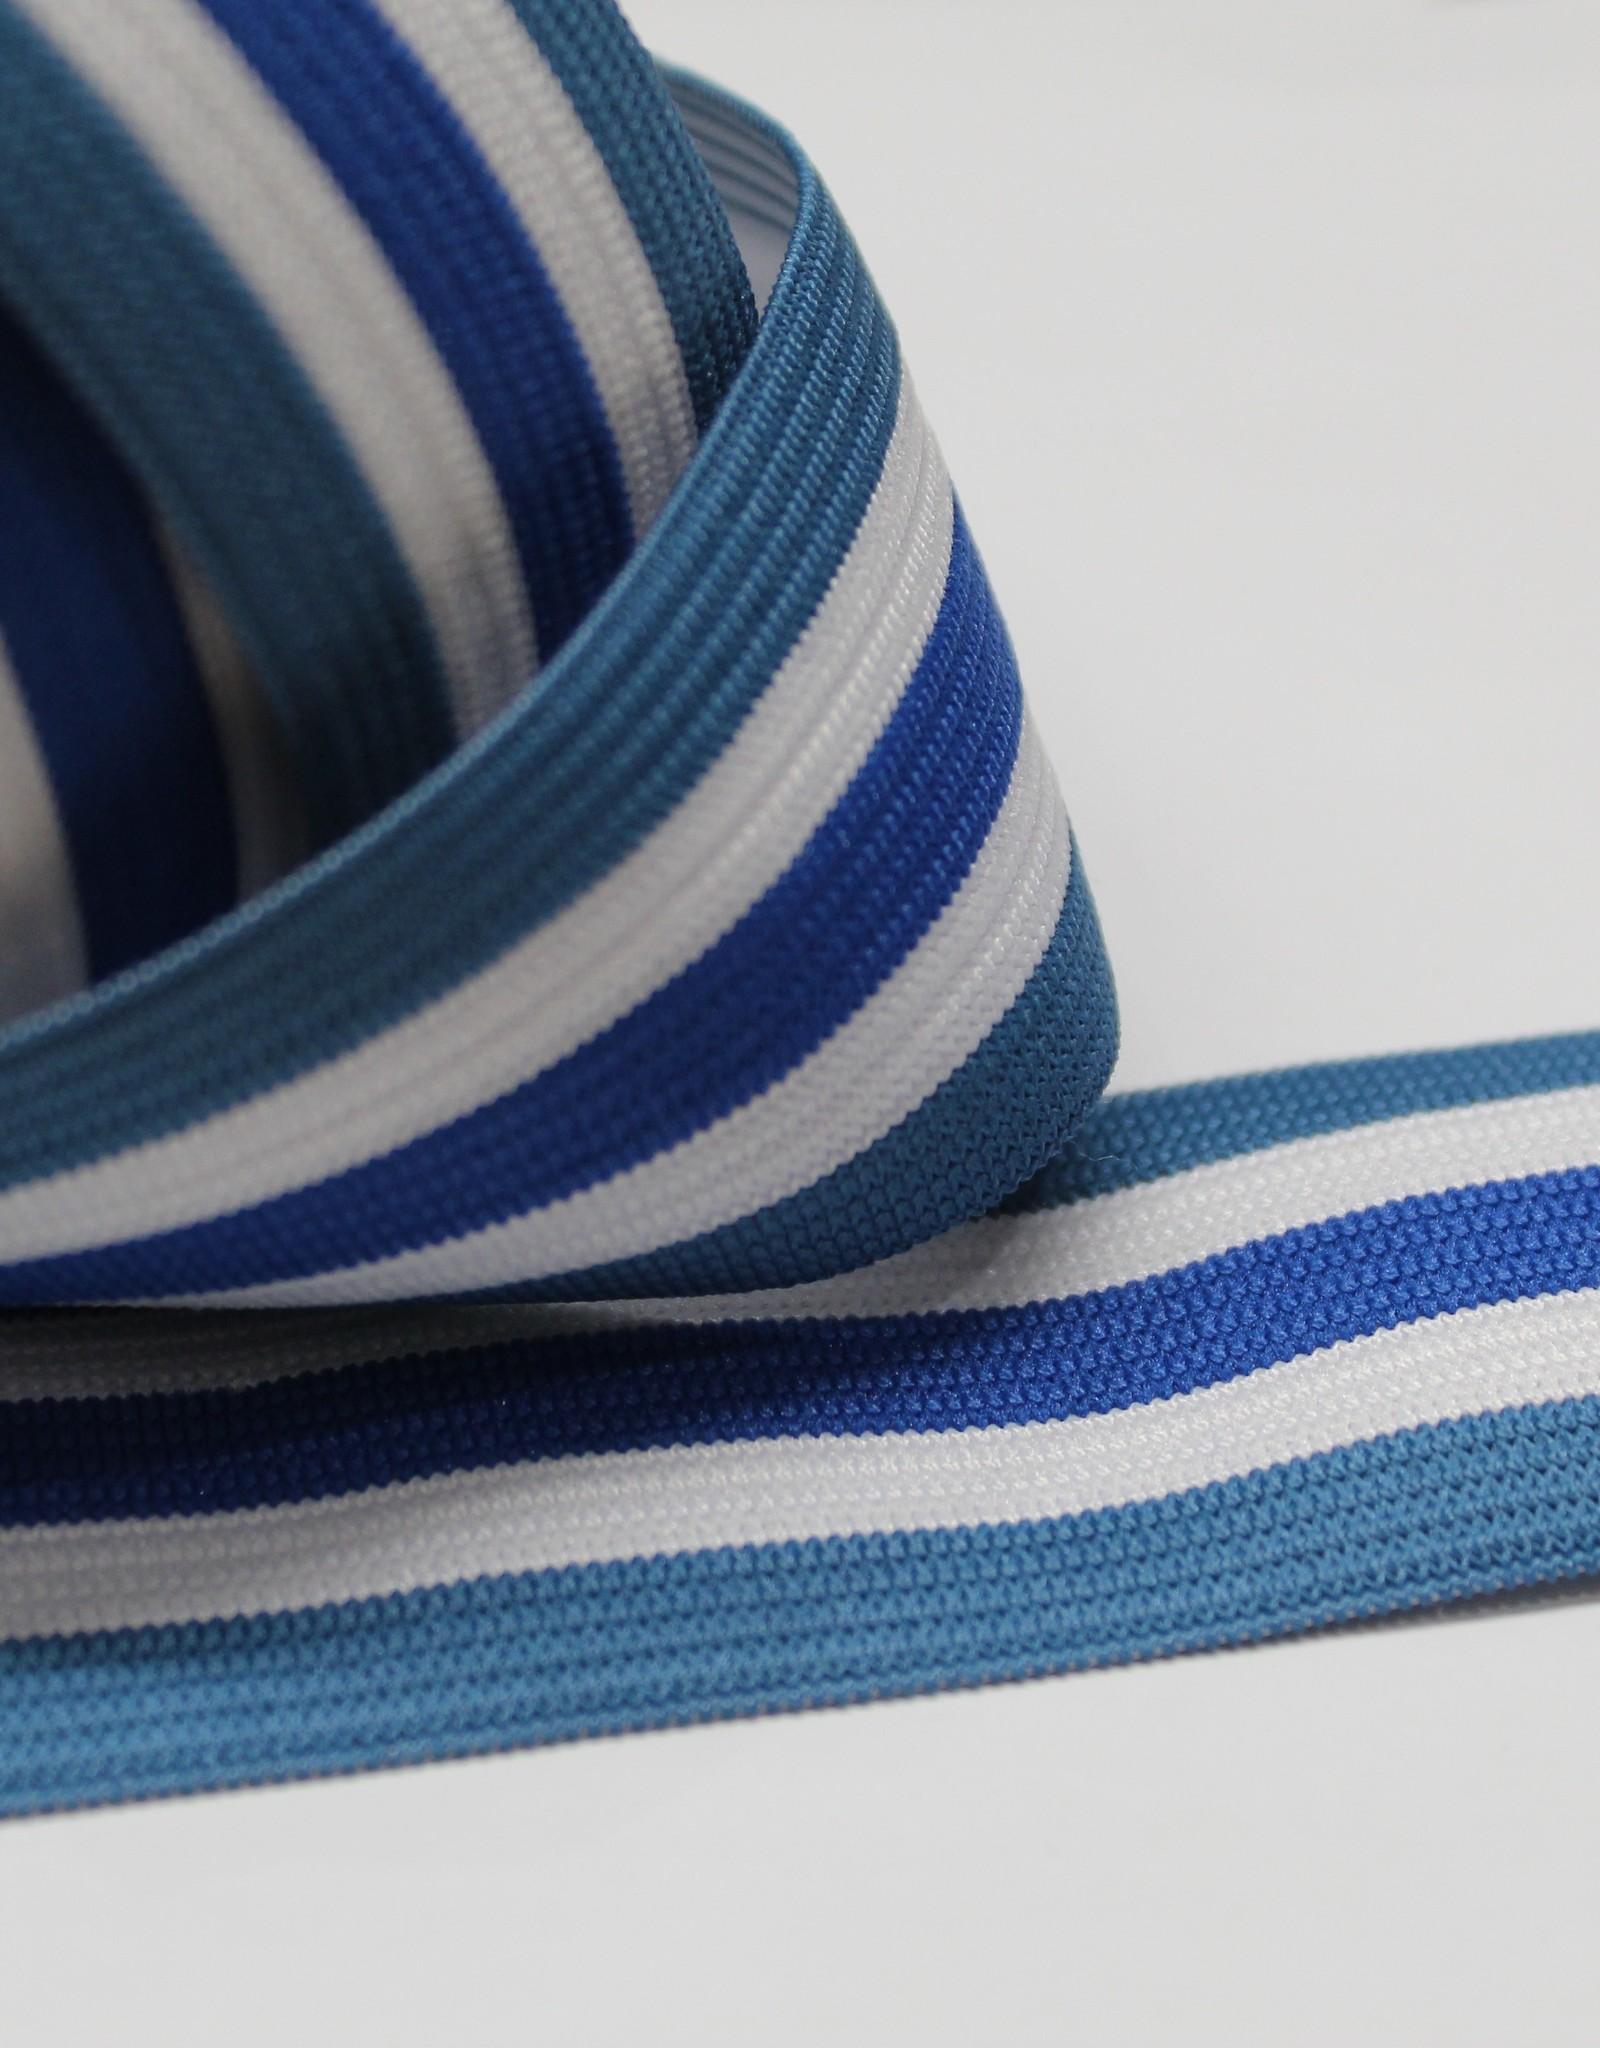 Elastiek gestreept blauw-wit-kobalt-wit-blauw 35mm